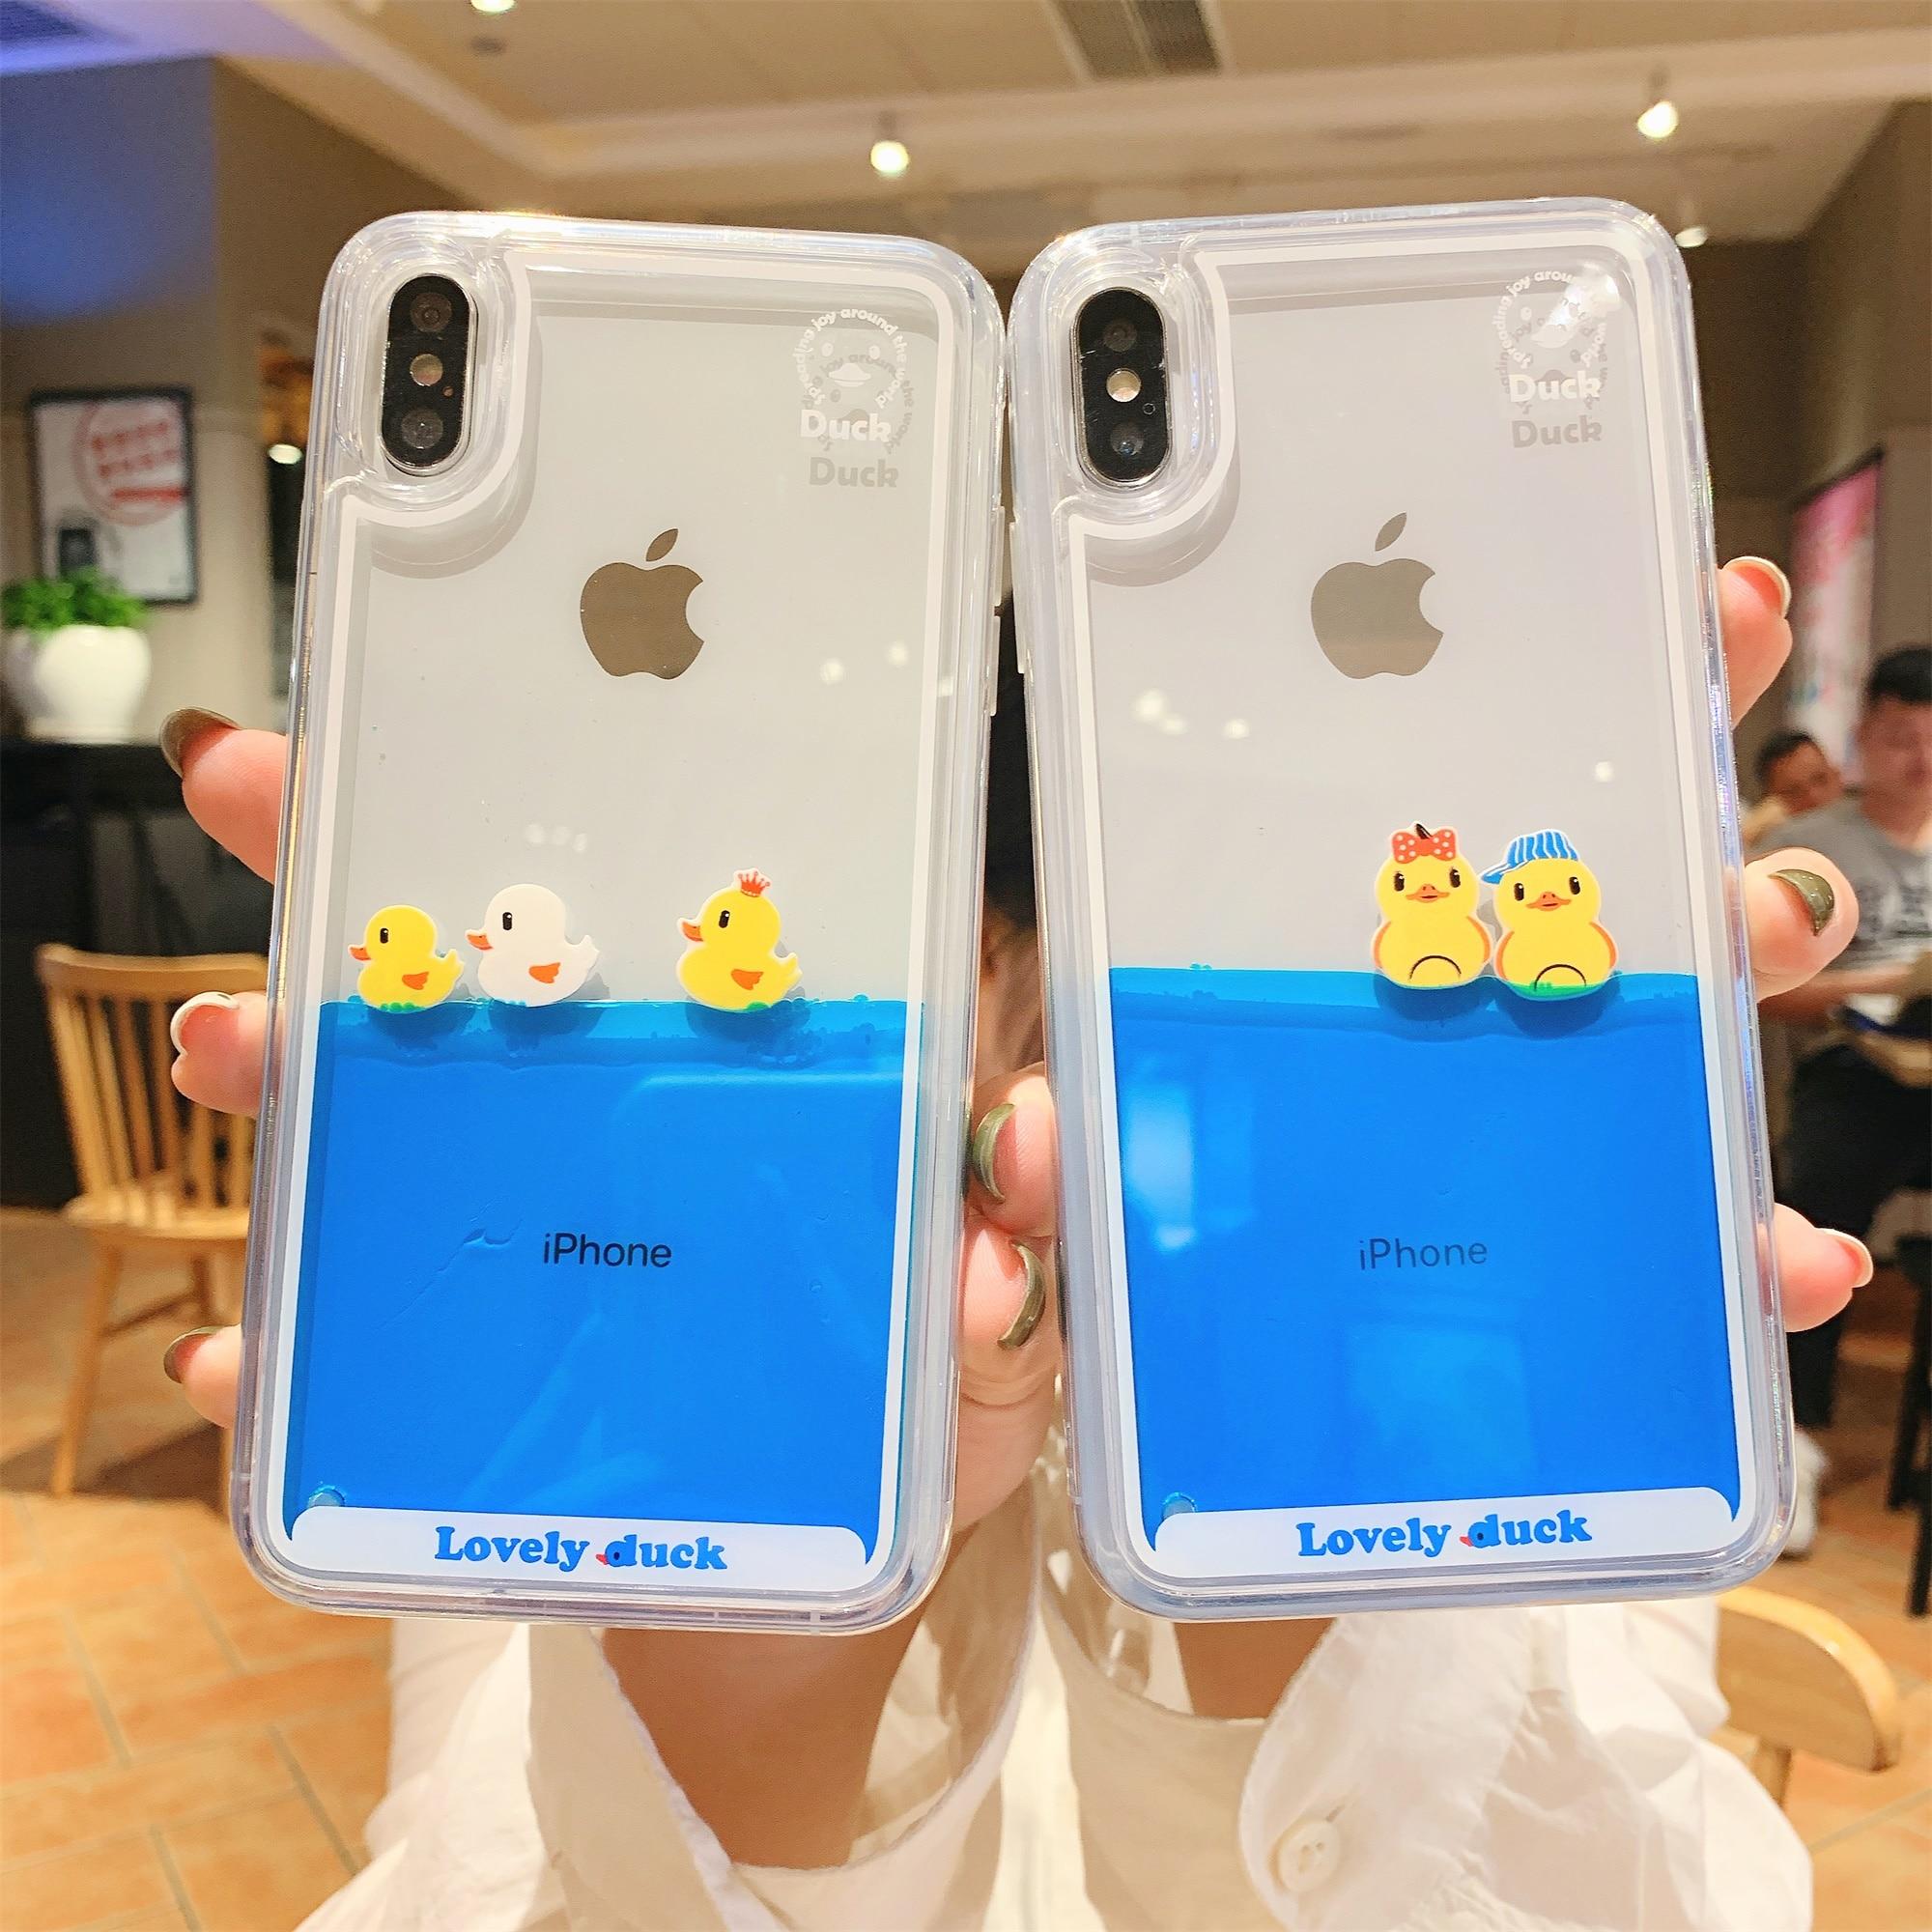 Liquid quicksand phone case For iphone8 6s 6 7 8 8Plus X XS XR XsMAX 11Pro 11 10 11ProMAX SE2020 3D dynamic swimming duck Case